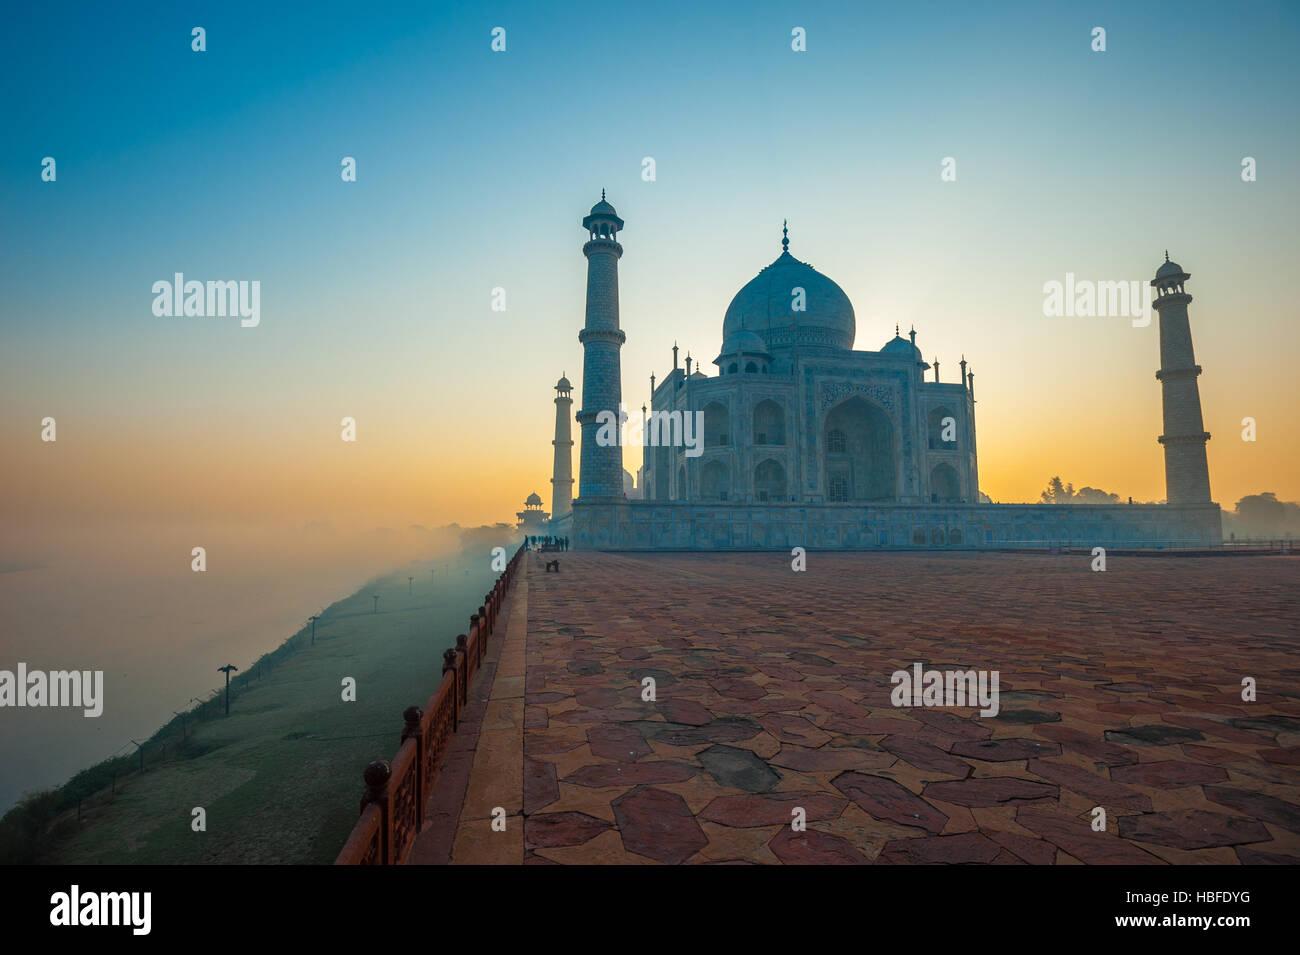 Al amanecer, el Taj Mahal de Agra, India Imagen De Stock